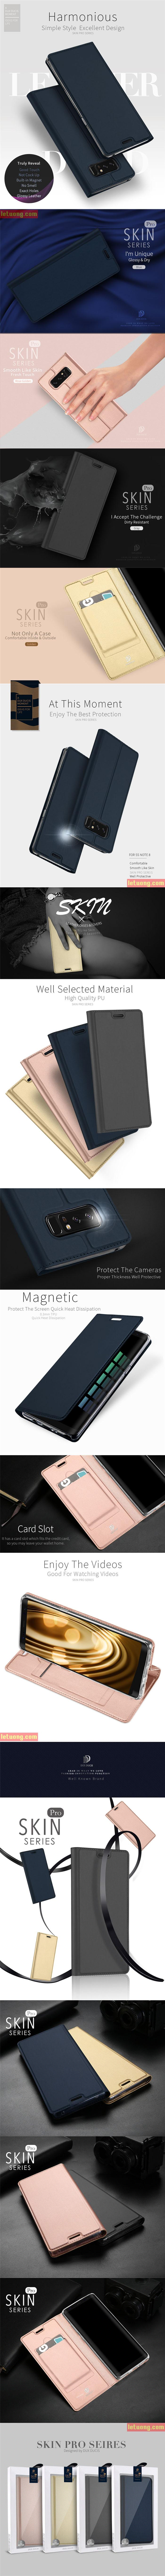 Bao da Galaxy Note 8 Dux Ducis Skin khung mềm siêu mỏng 4